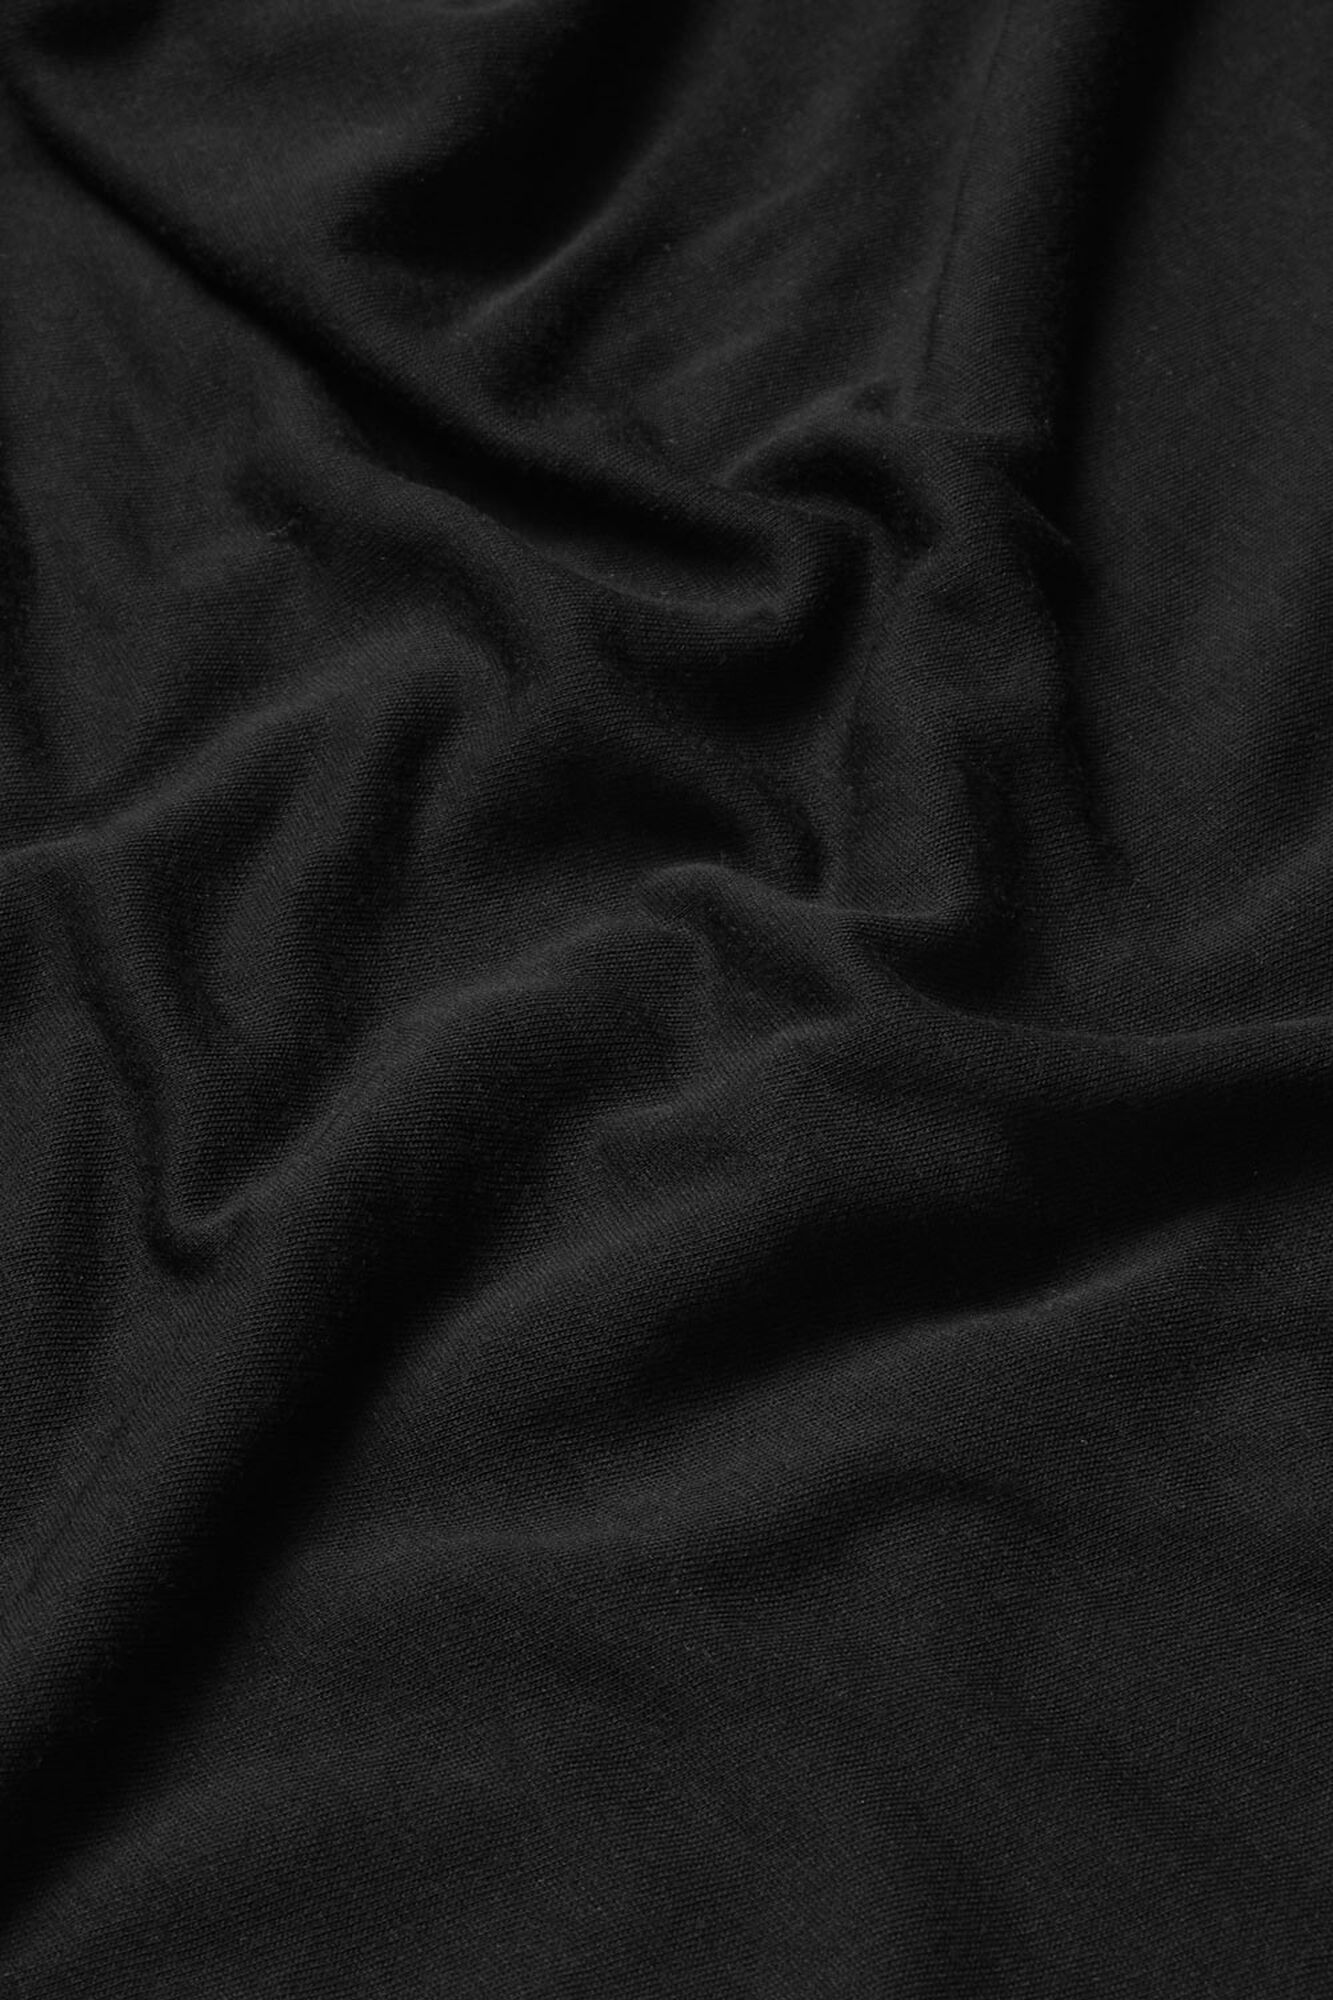 AMEGA SKJERF, Black, hi-res